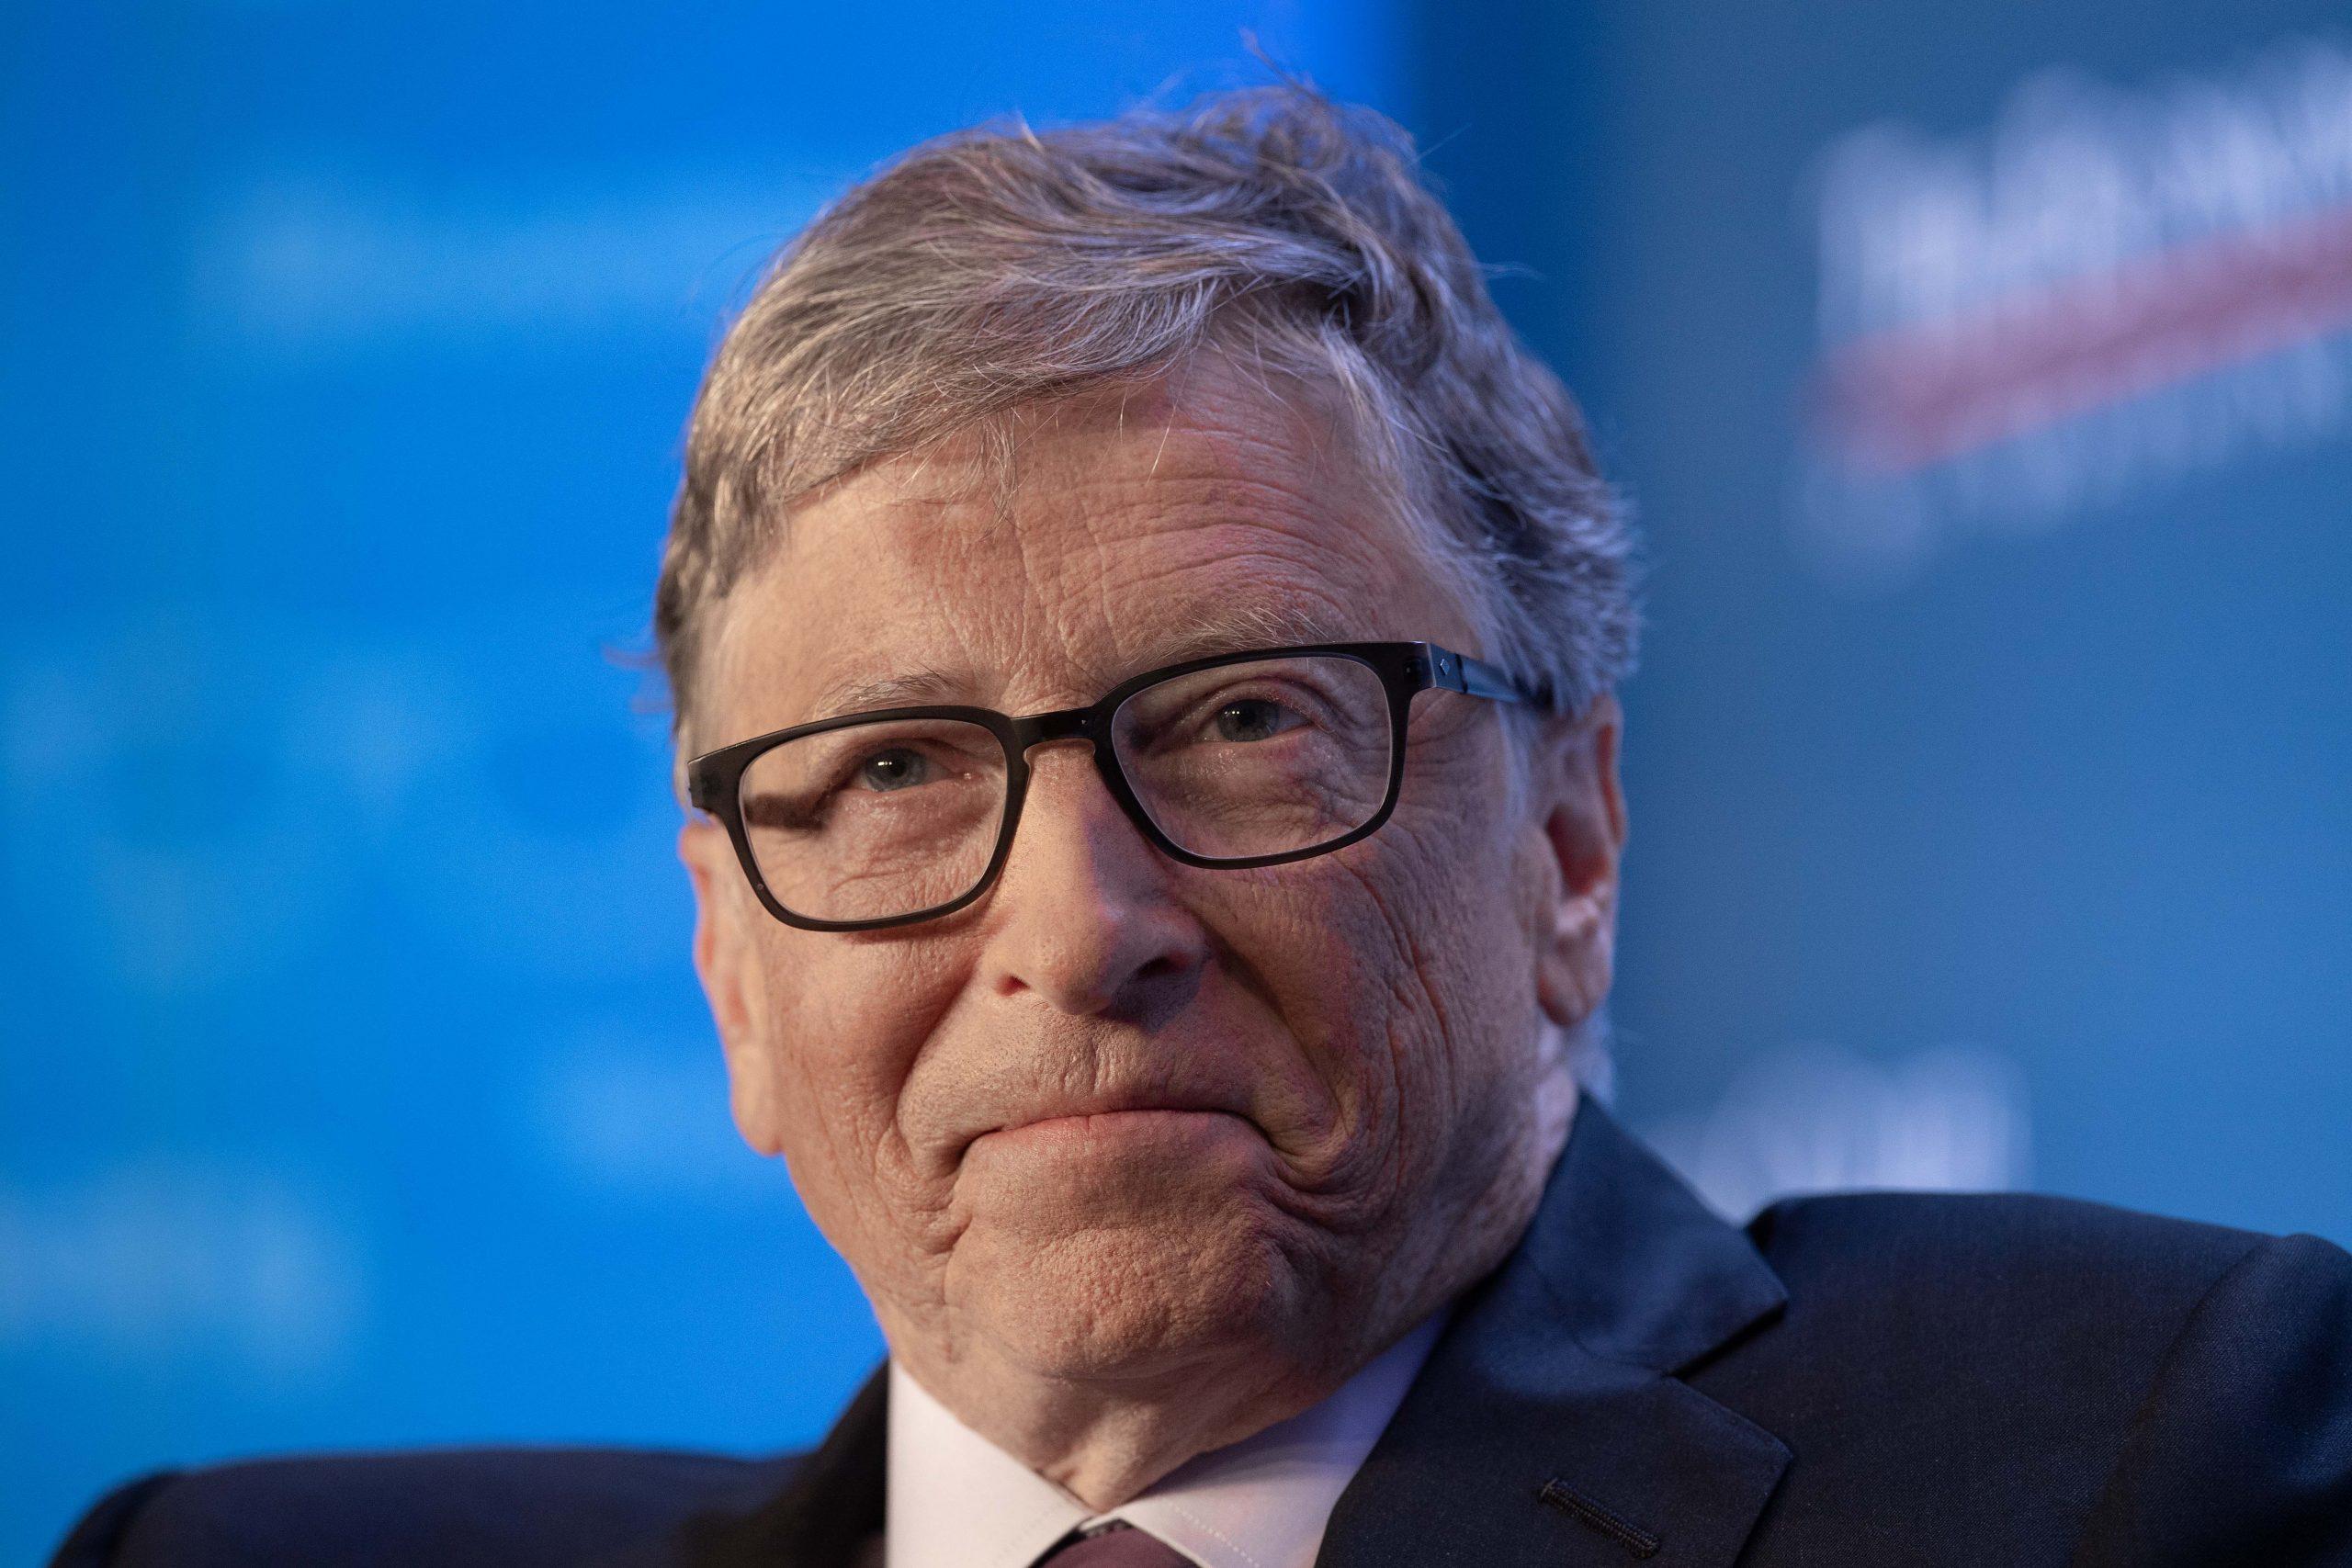 Bill Gates on his remote work schedule during epidemics